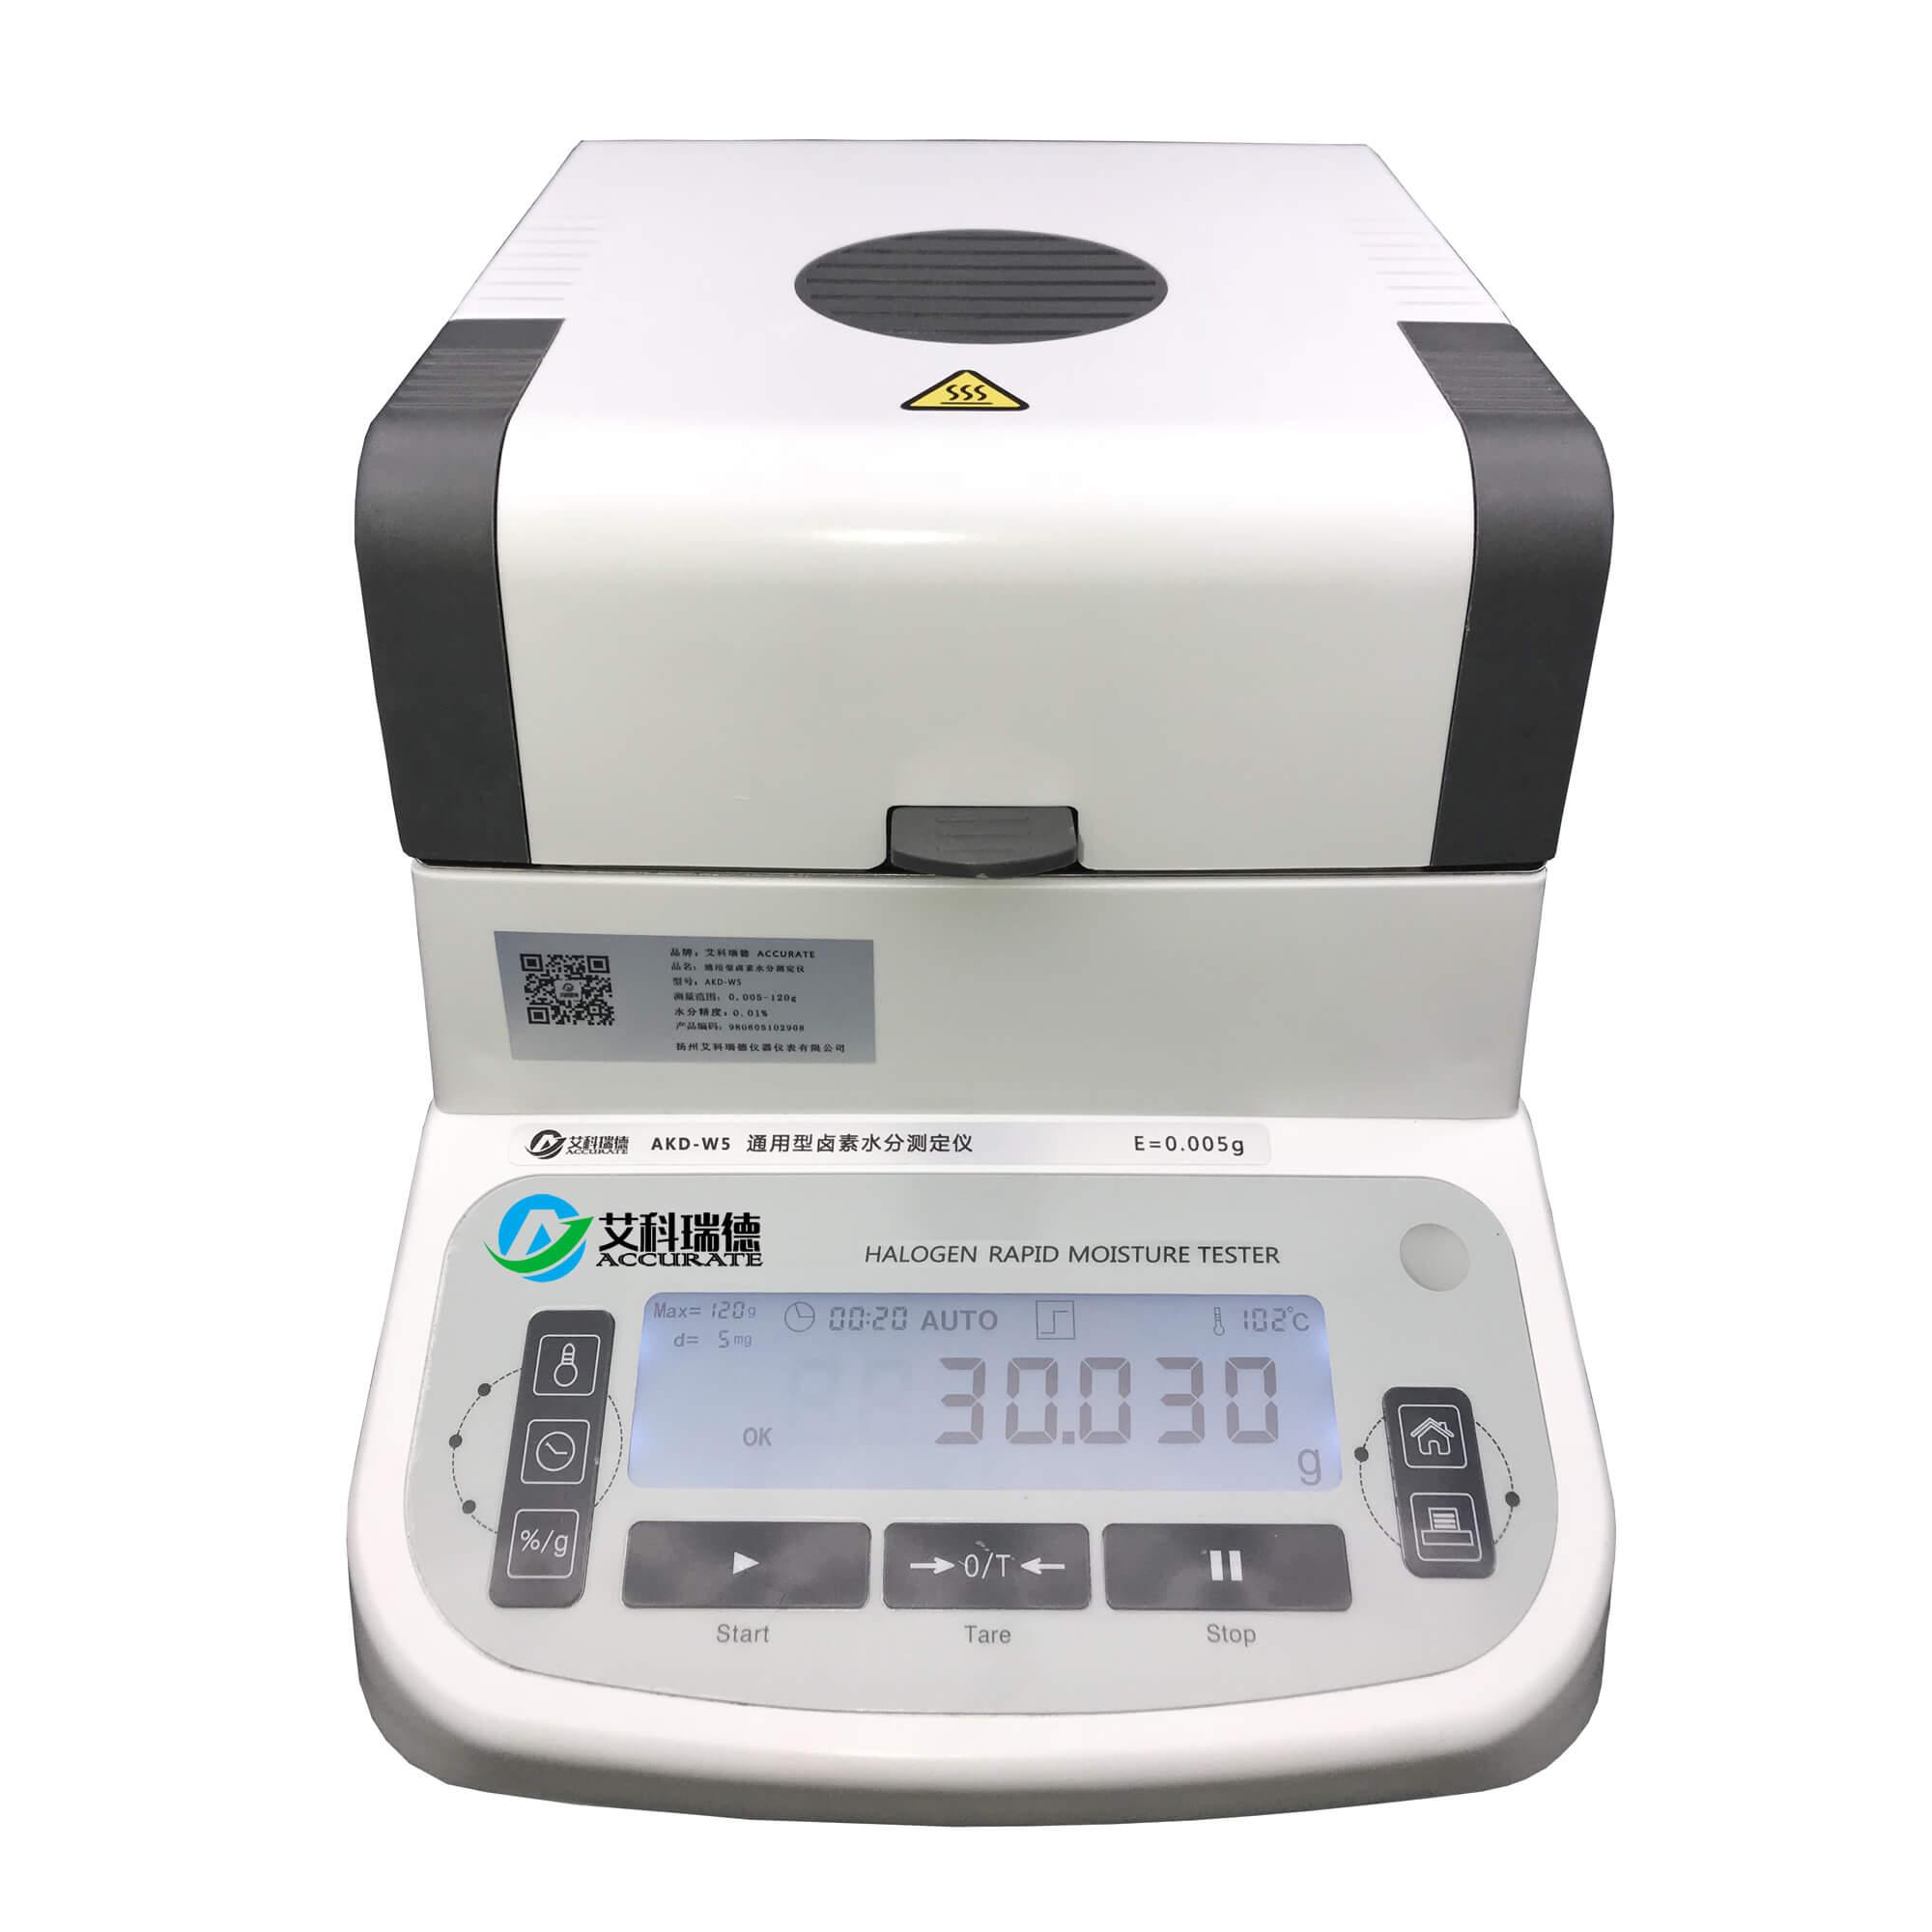 AKD-W5通用型卤素水分测定仪